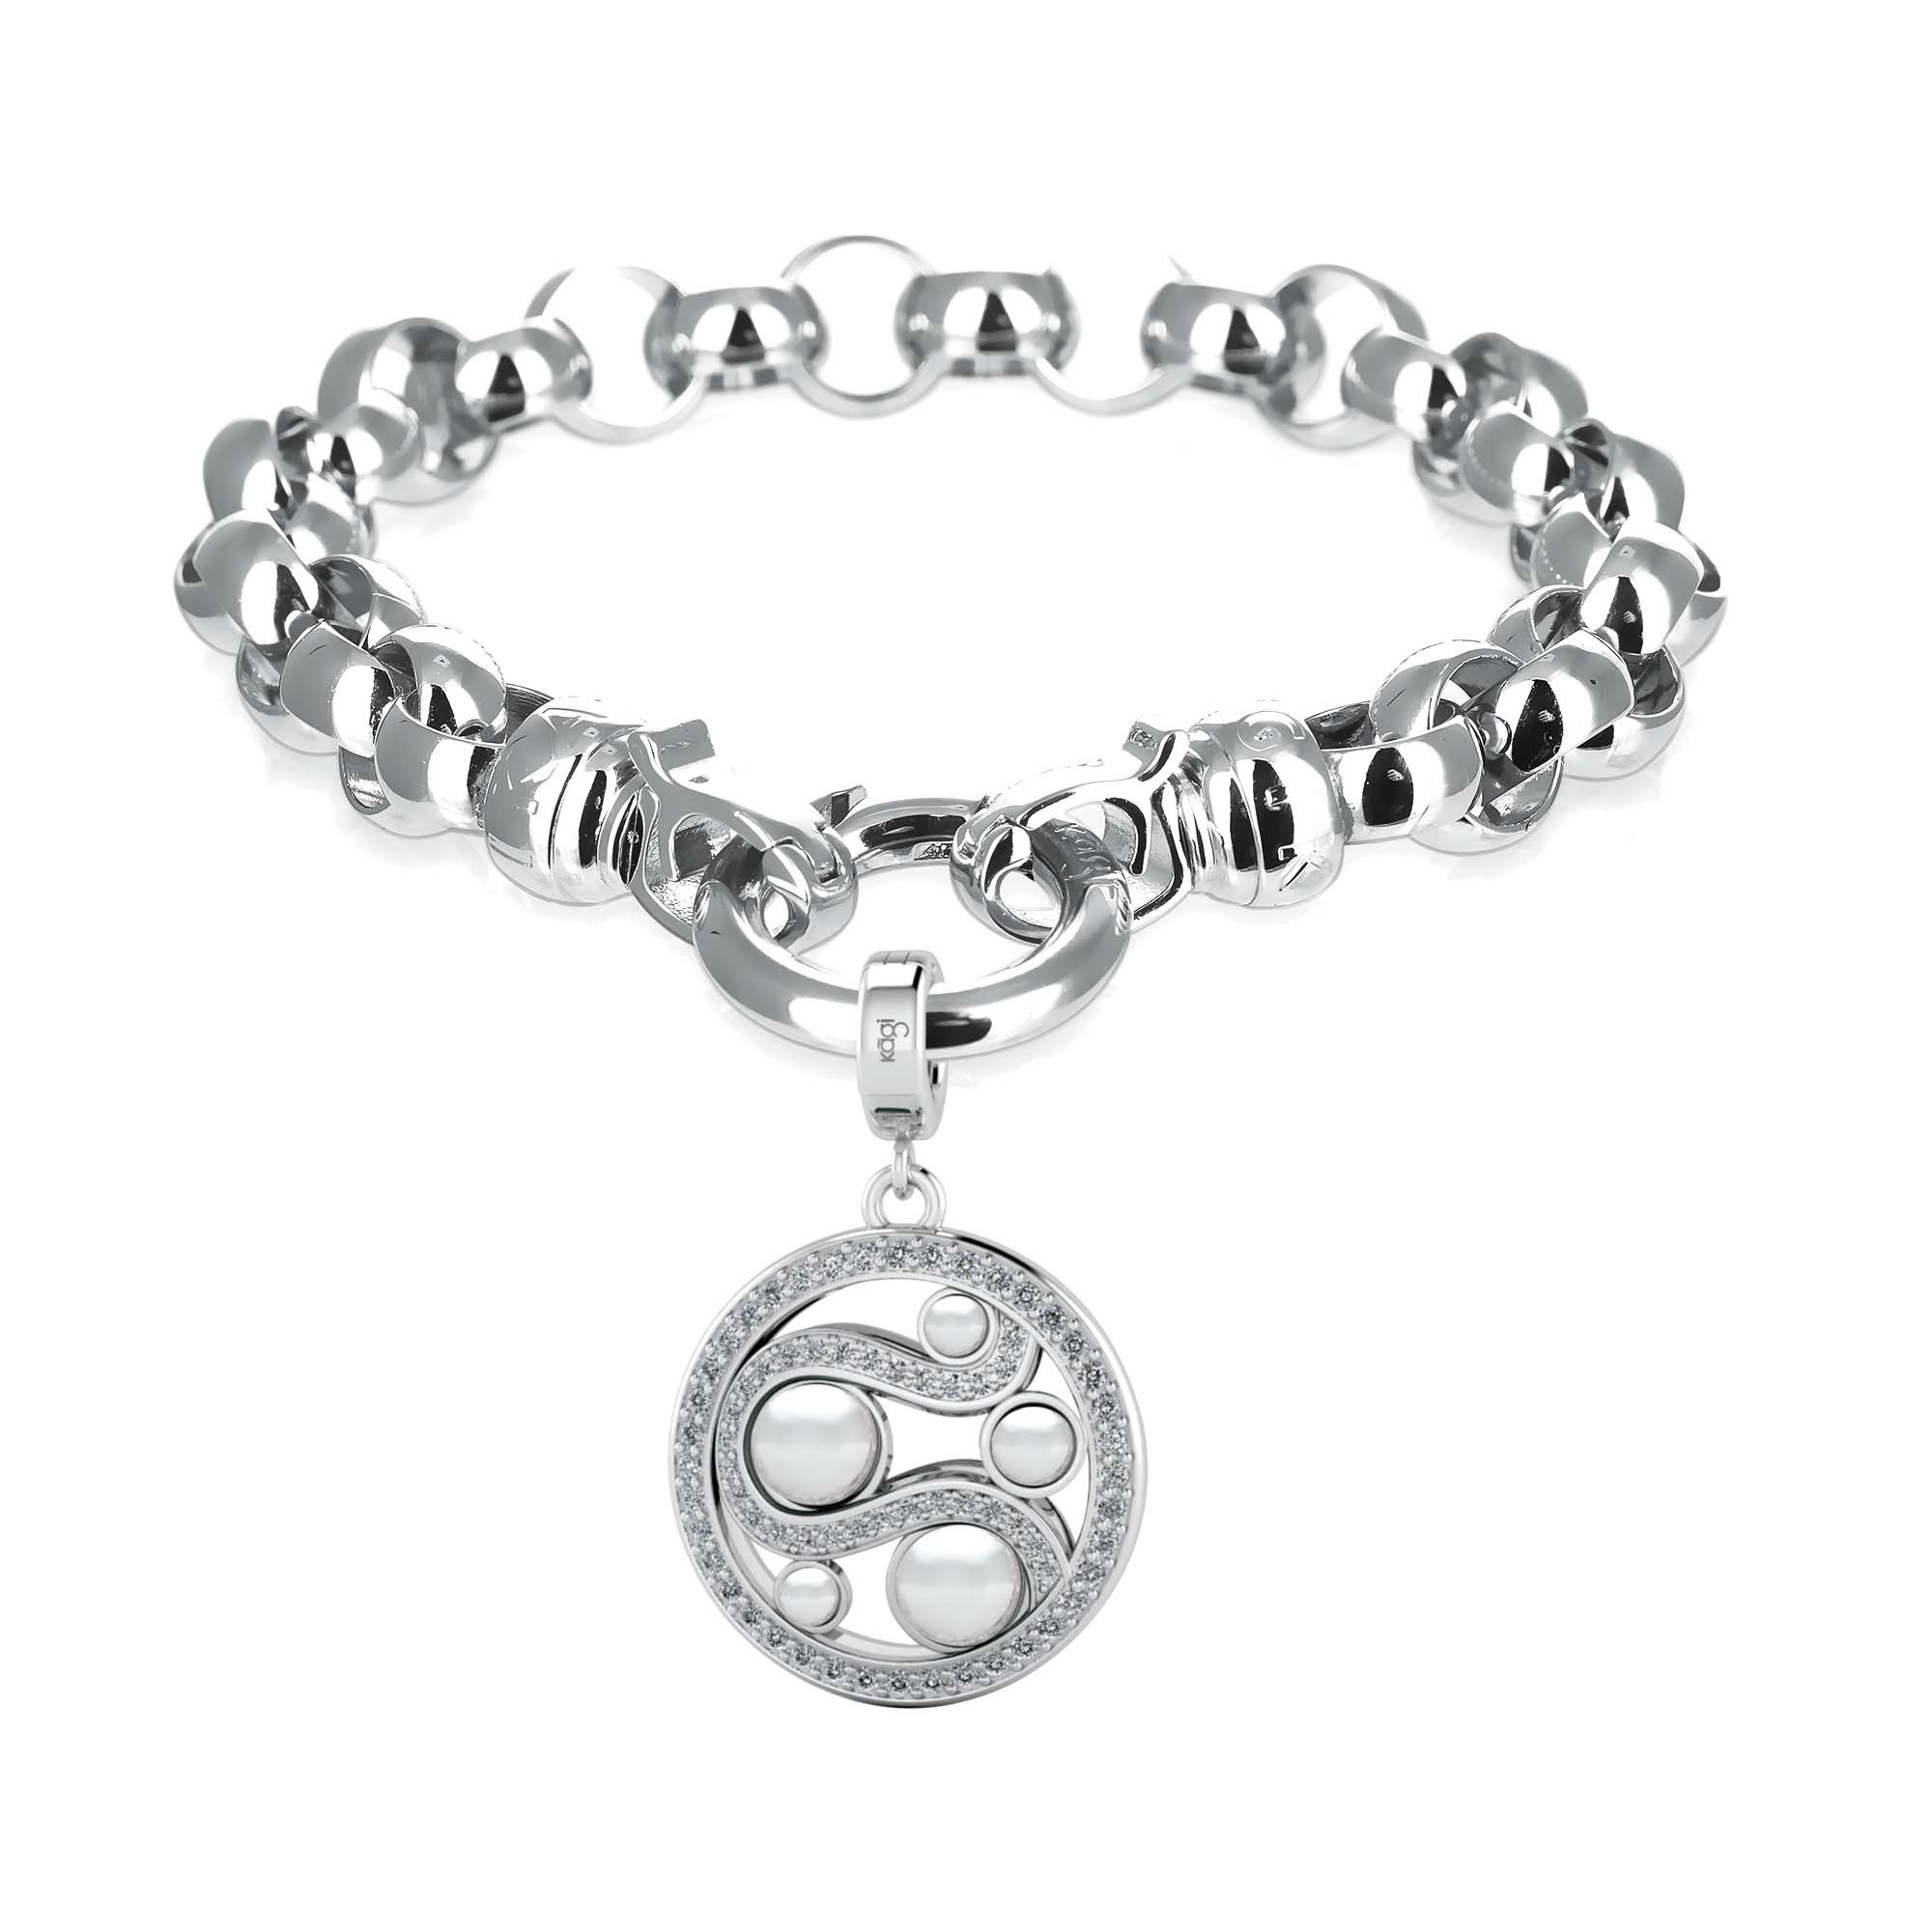 Kagi Steel Me Silver Bracelet $169 with Mystic Pearl Pendant Small $149 www.kagi.net